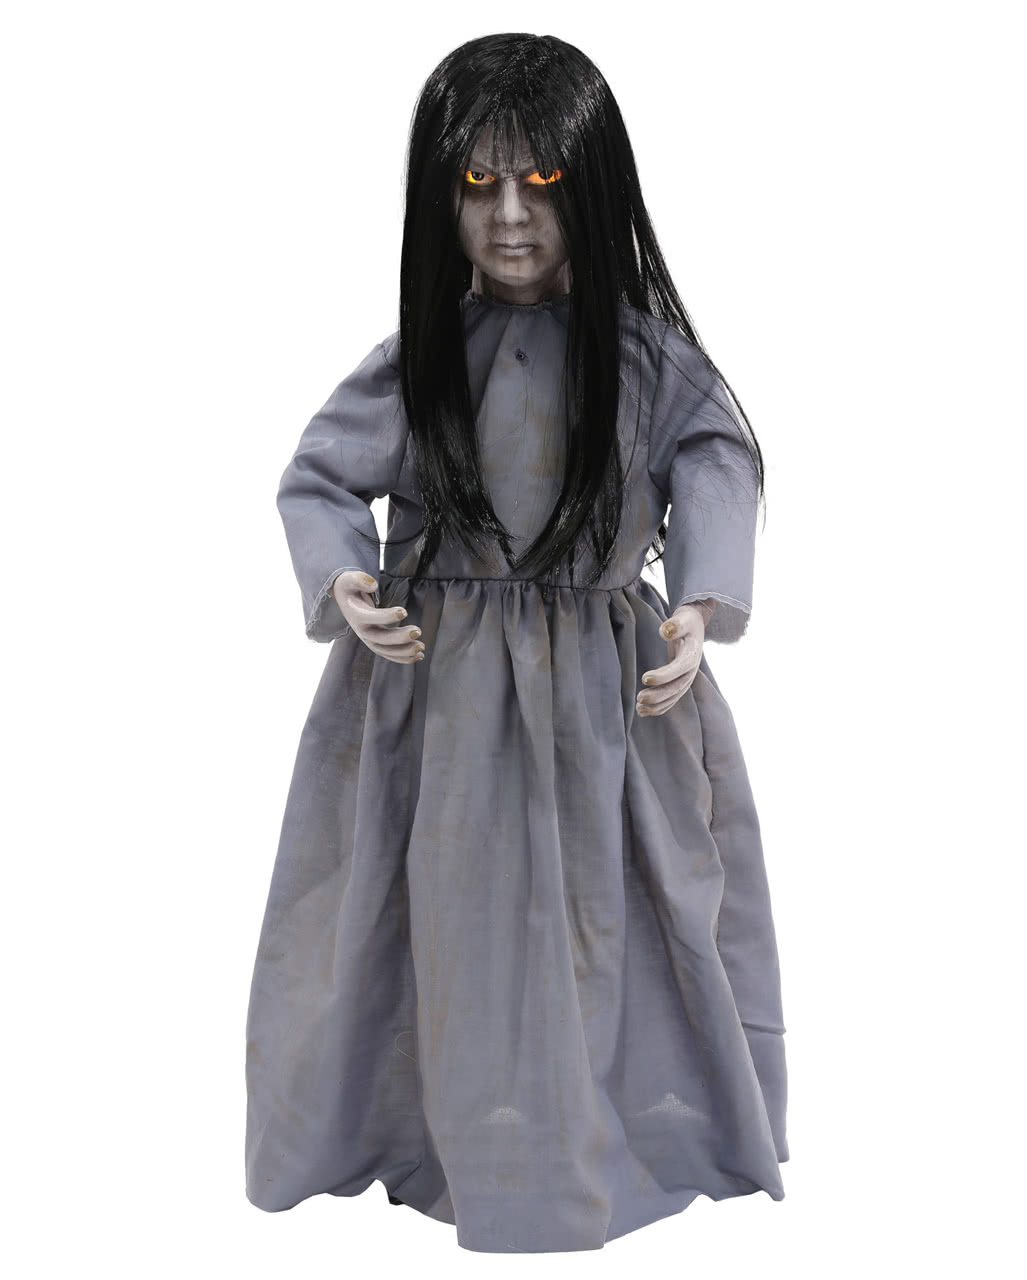 Creepy Demon Girl Doll Halloween Decoration